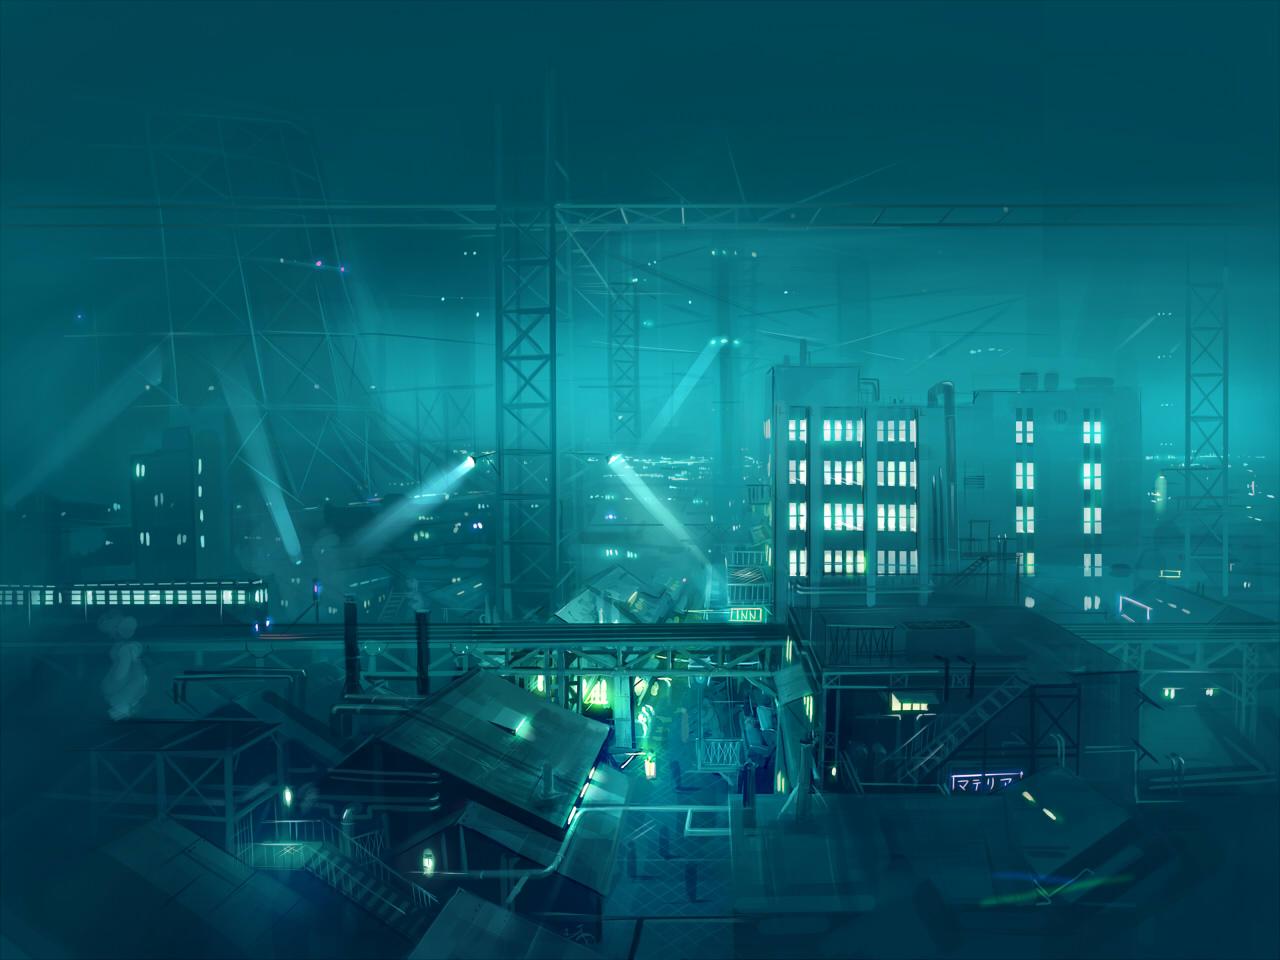 building city final_fantasy final_fantasy_vii night scenic seo_tatsuya train